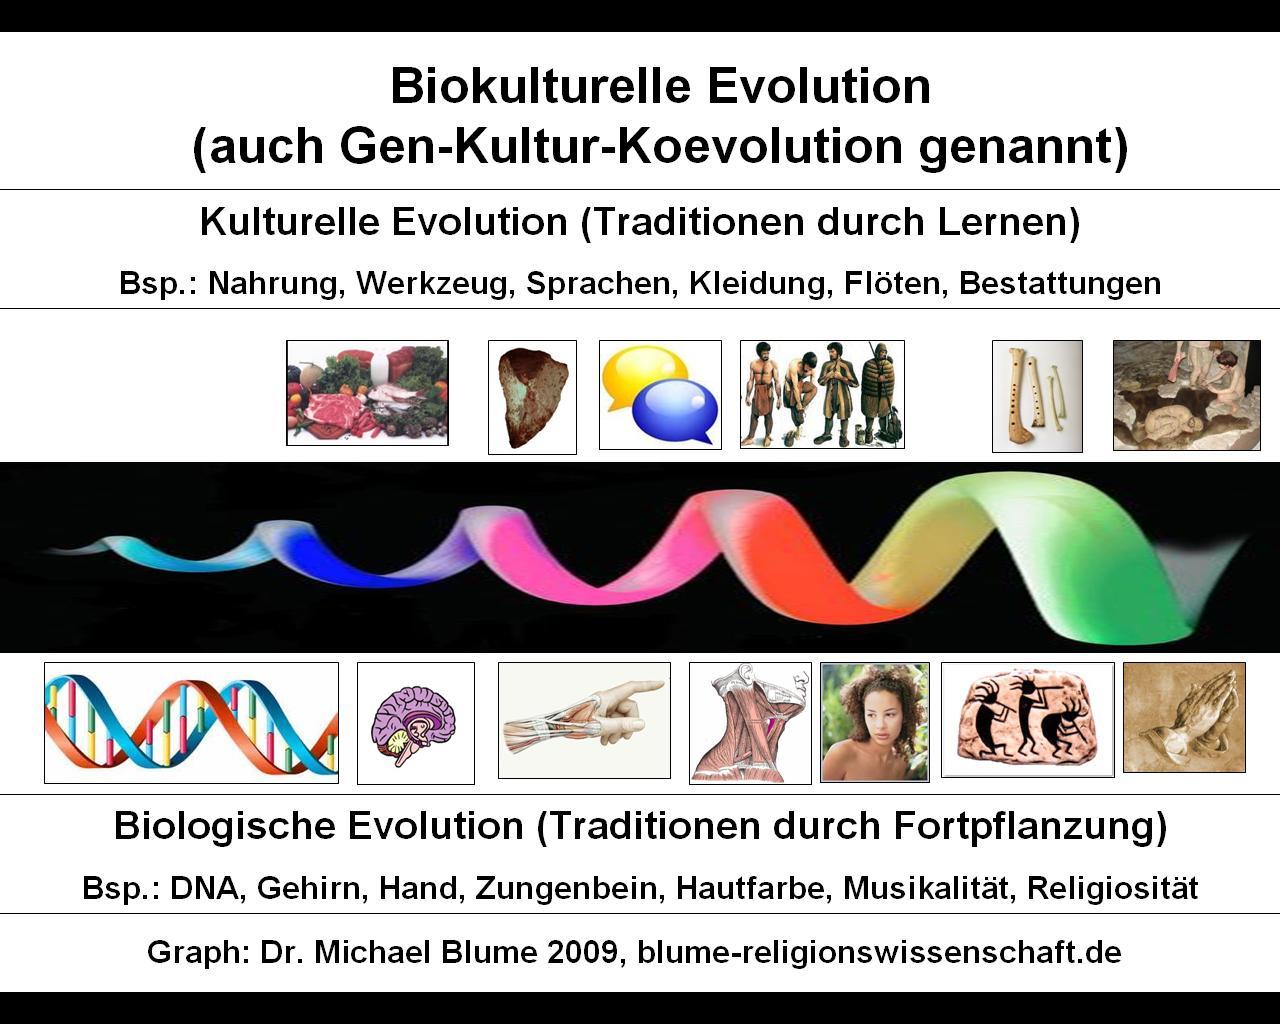 Evolutionsforschung interdisziplinär - Der kreative Mensch zwischen ...